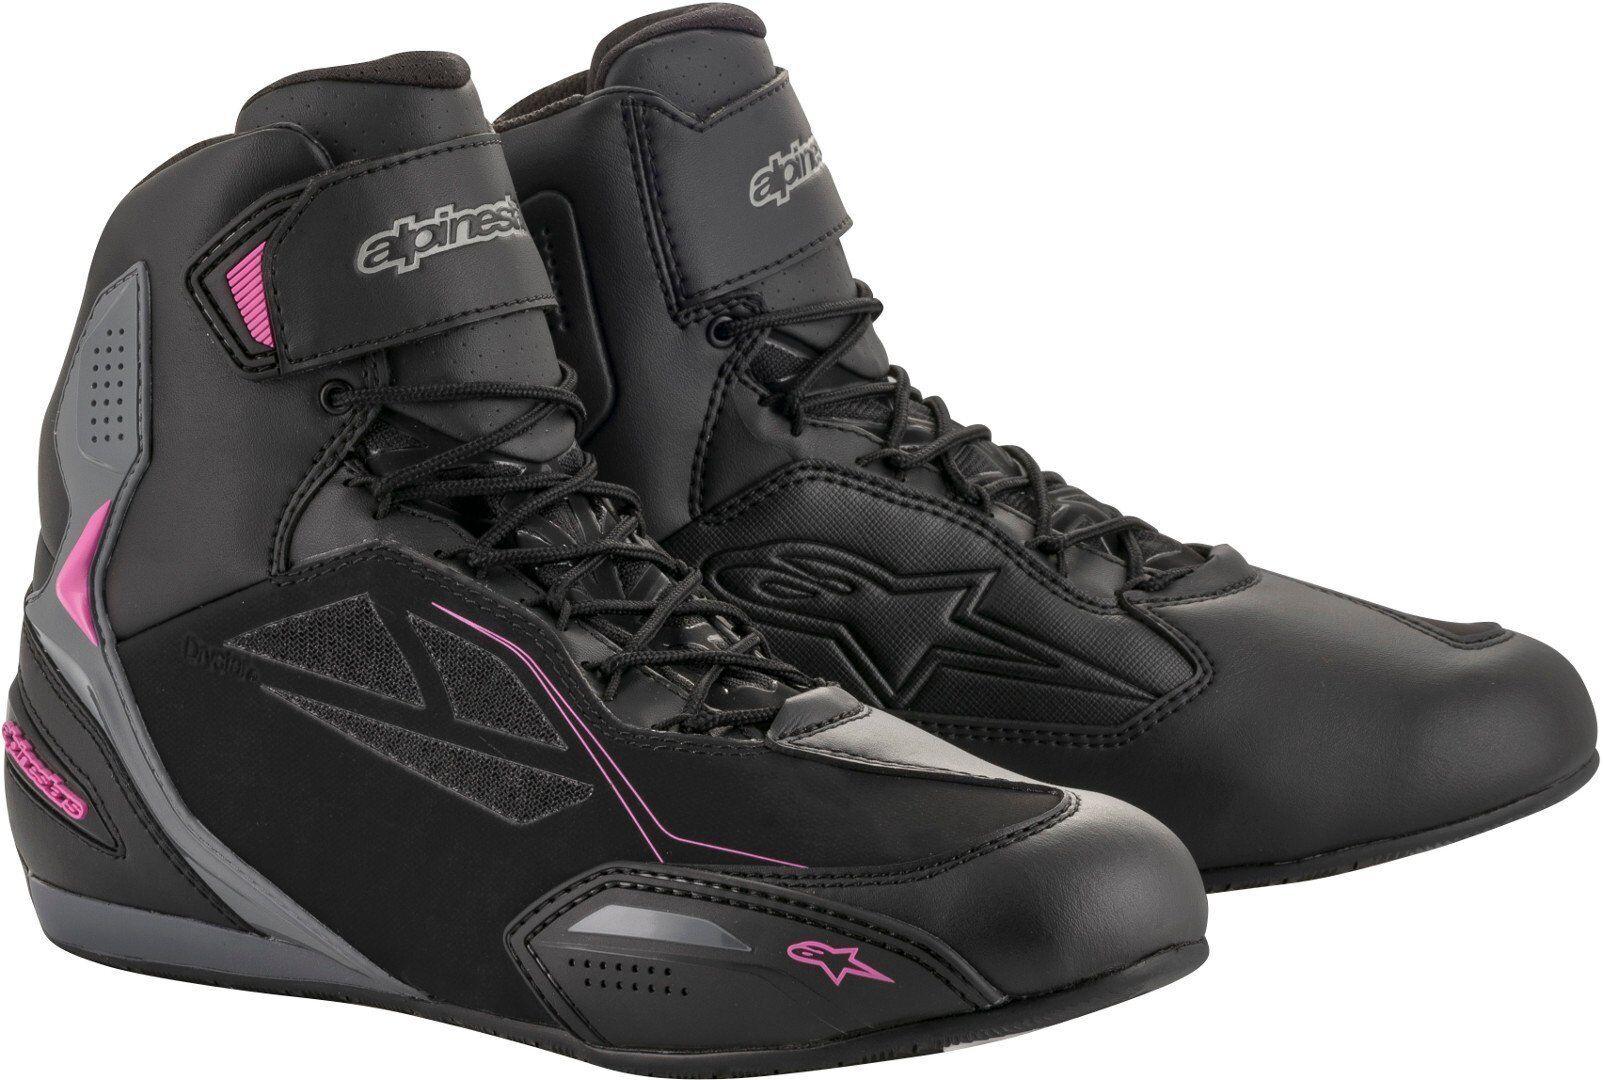 Alpinestars Stella Faster-3 Drystar Chaussures de moto de dames Noir Gris Rose taille : 42